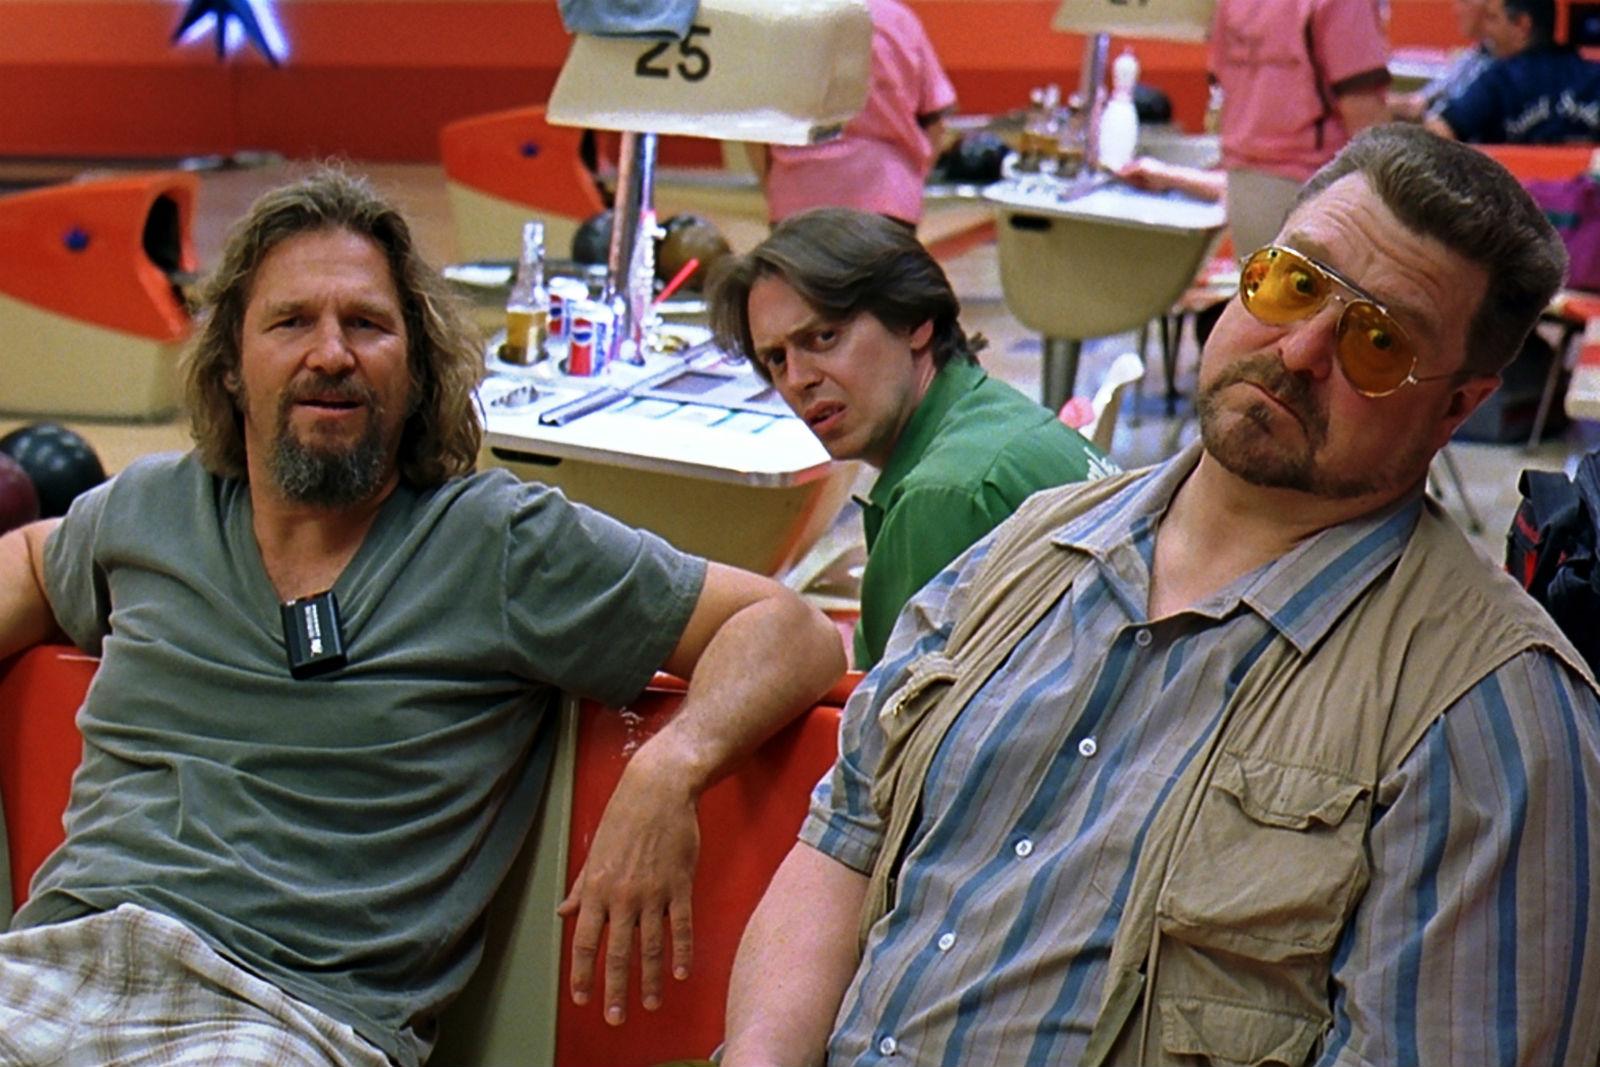 Jeff Bridges, Steve Buscemi and John Goodman haunting the lanes in The Big Lebowski.